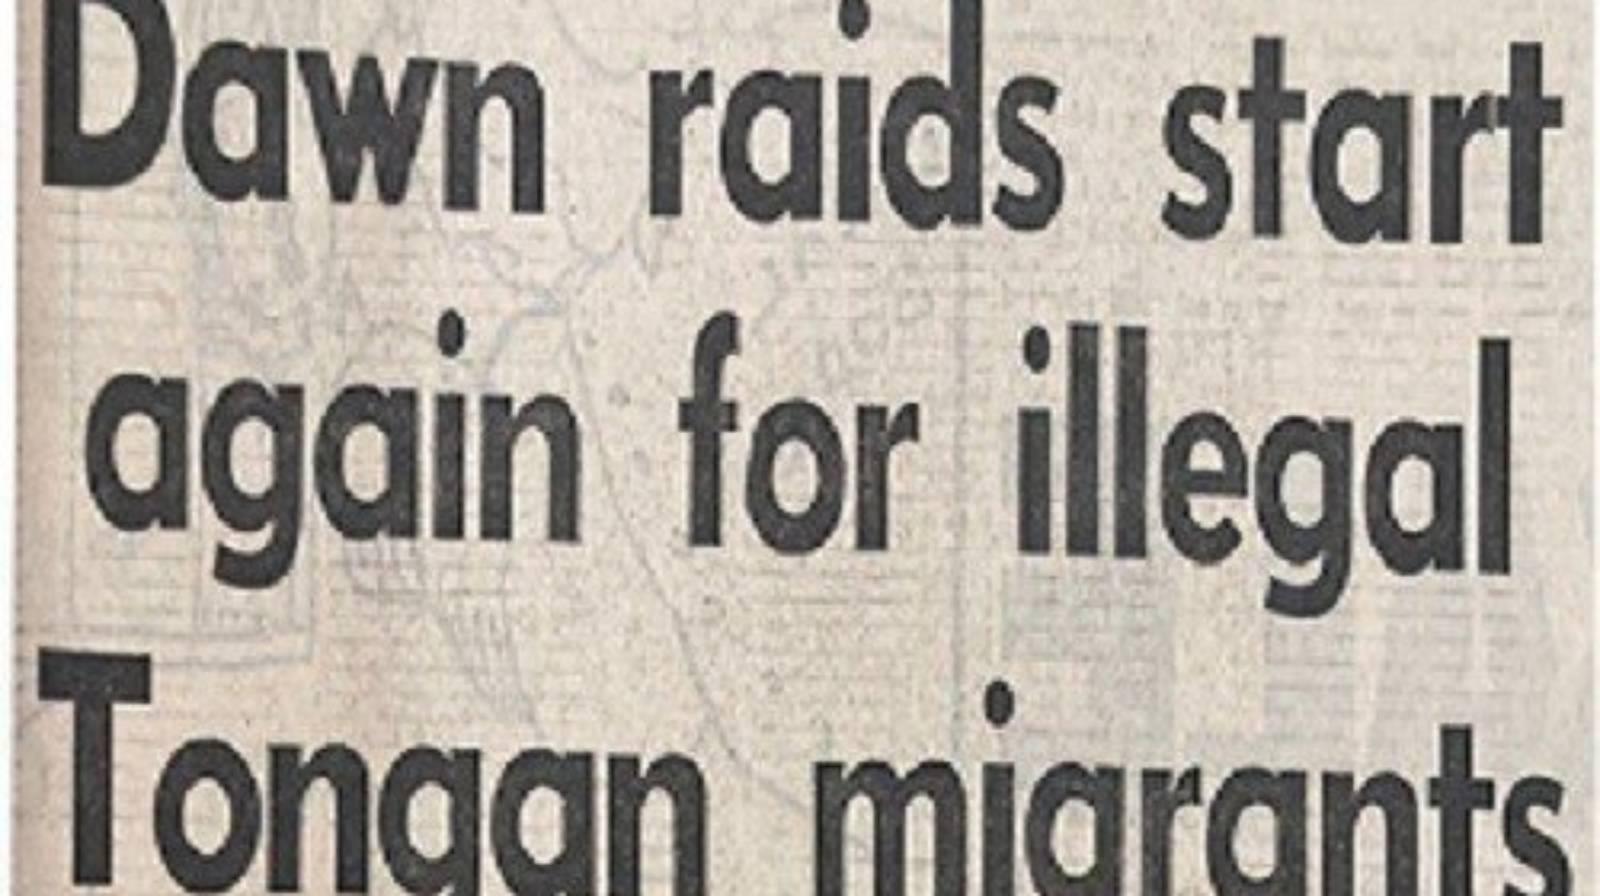 The dawn raids explained